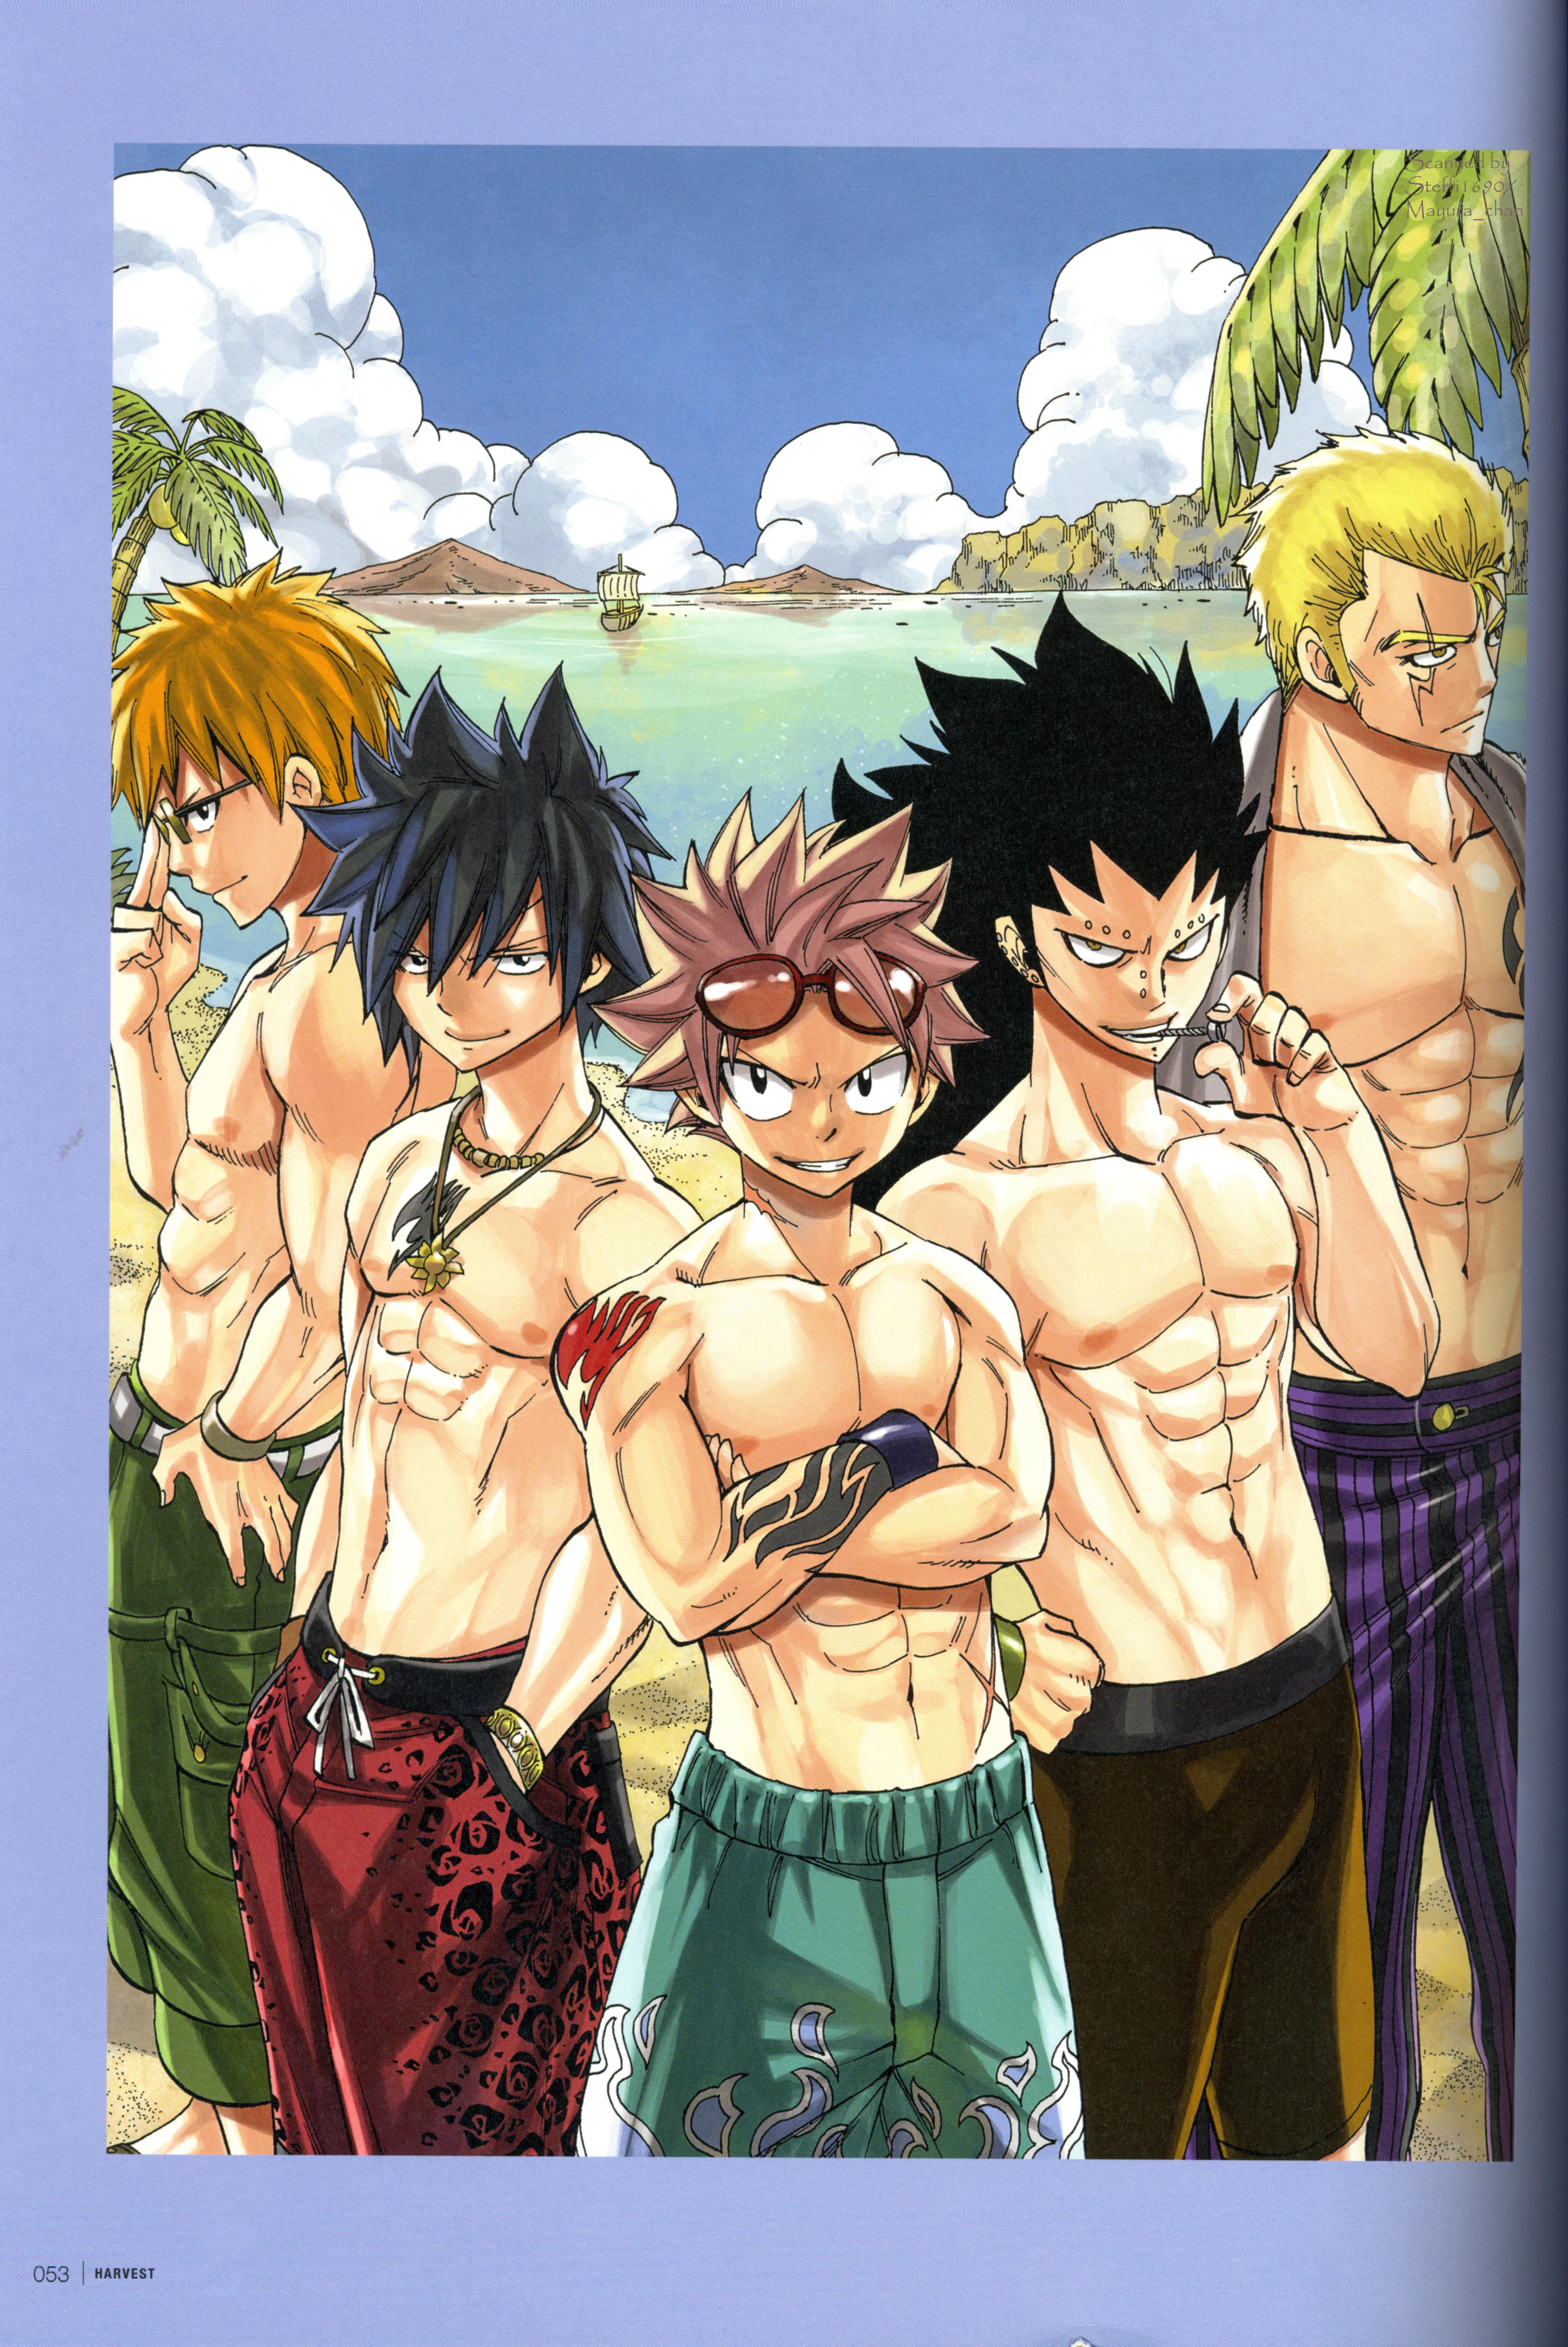 Fairy Tail Mobile Wallpaper 2060188 Zerochan Anime Image